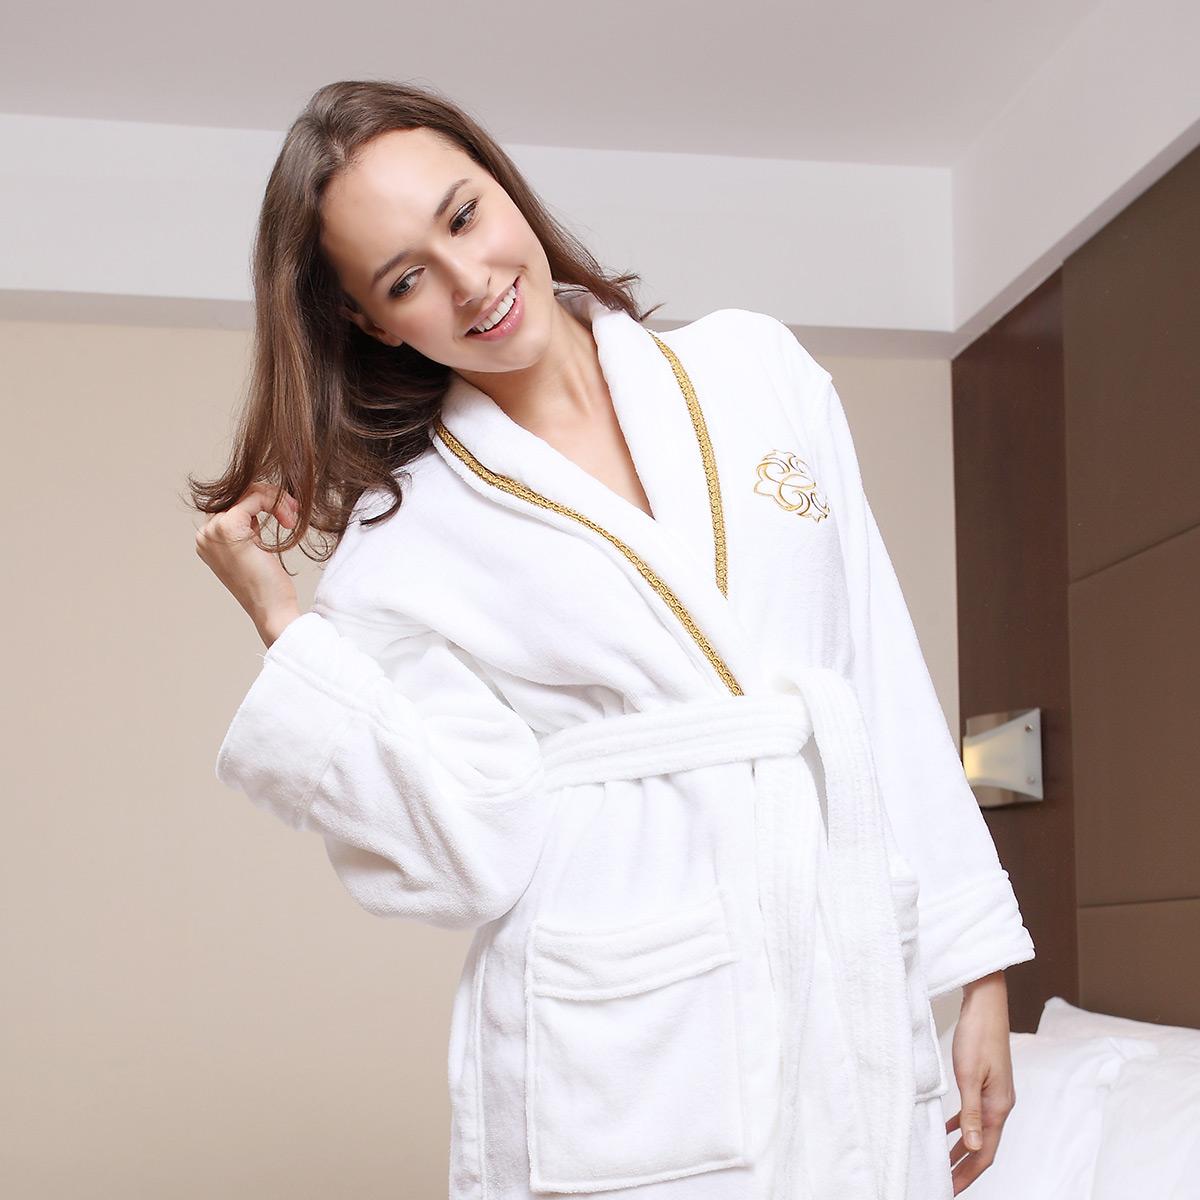 free shipping thickening bathrobes 100% toweled cotton robe hotel supplies bath robes(China (Mainland))